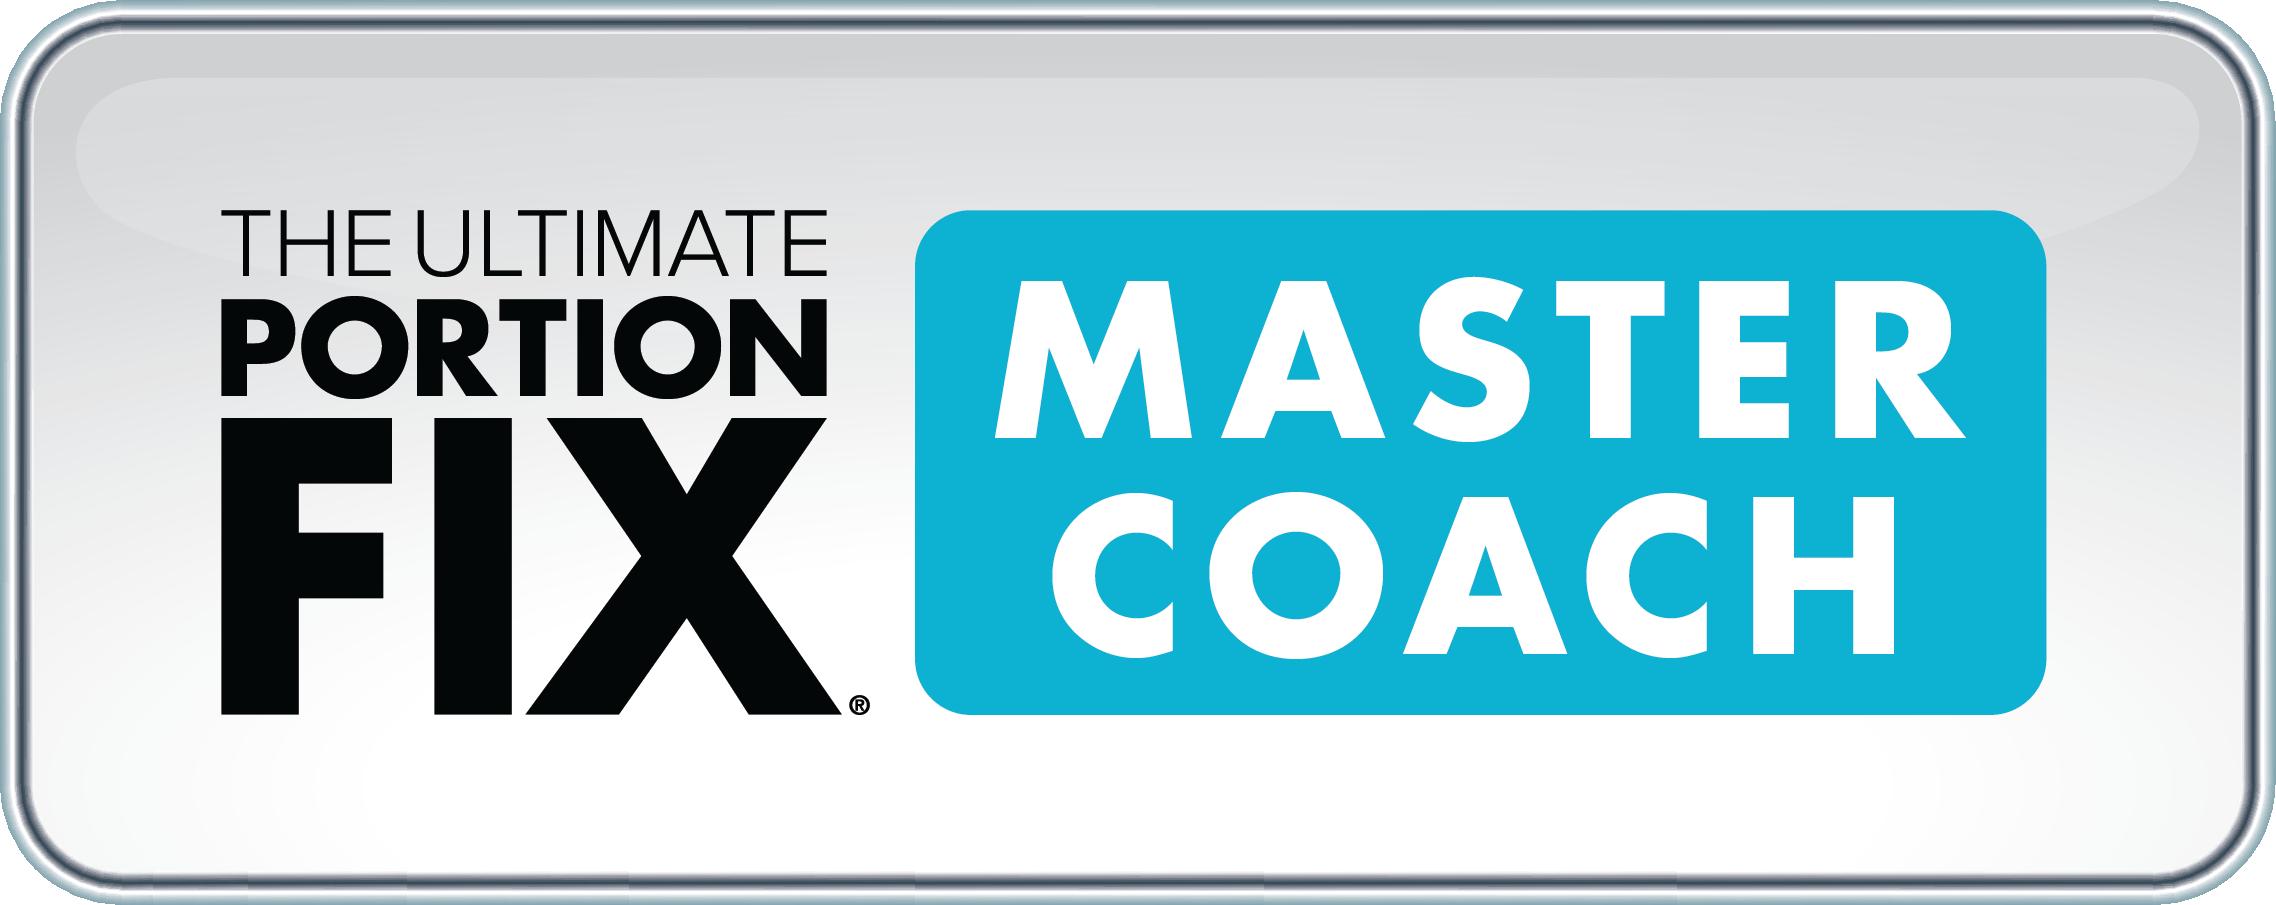 UPF_Master-Coach_eBadge_Horizontal_4C.png